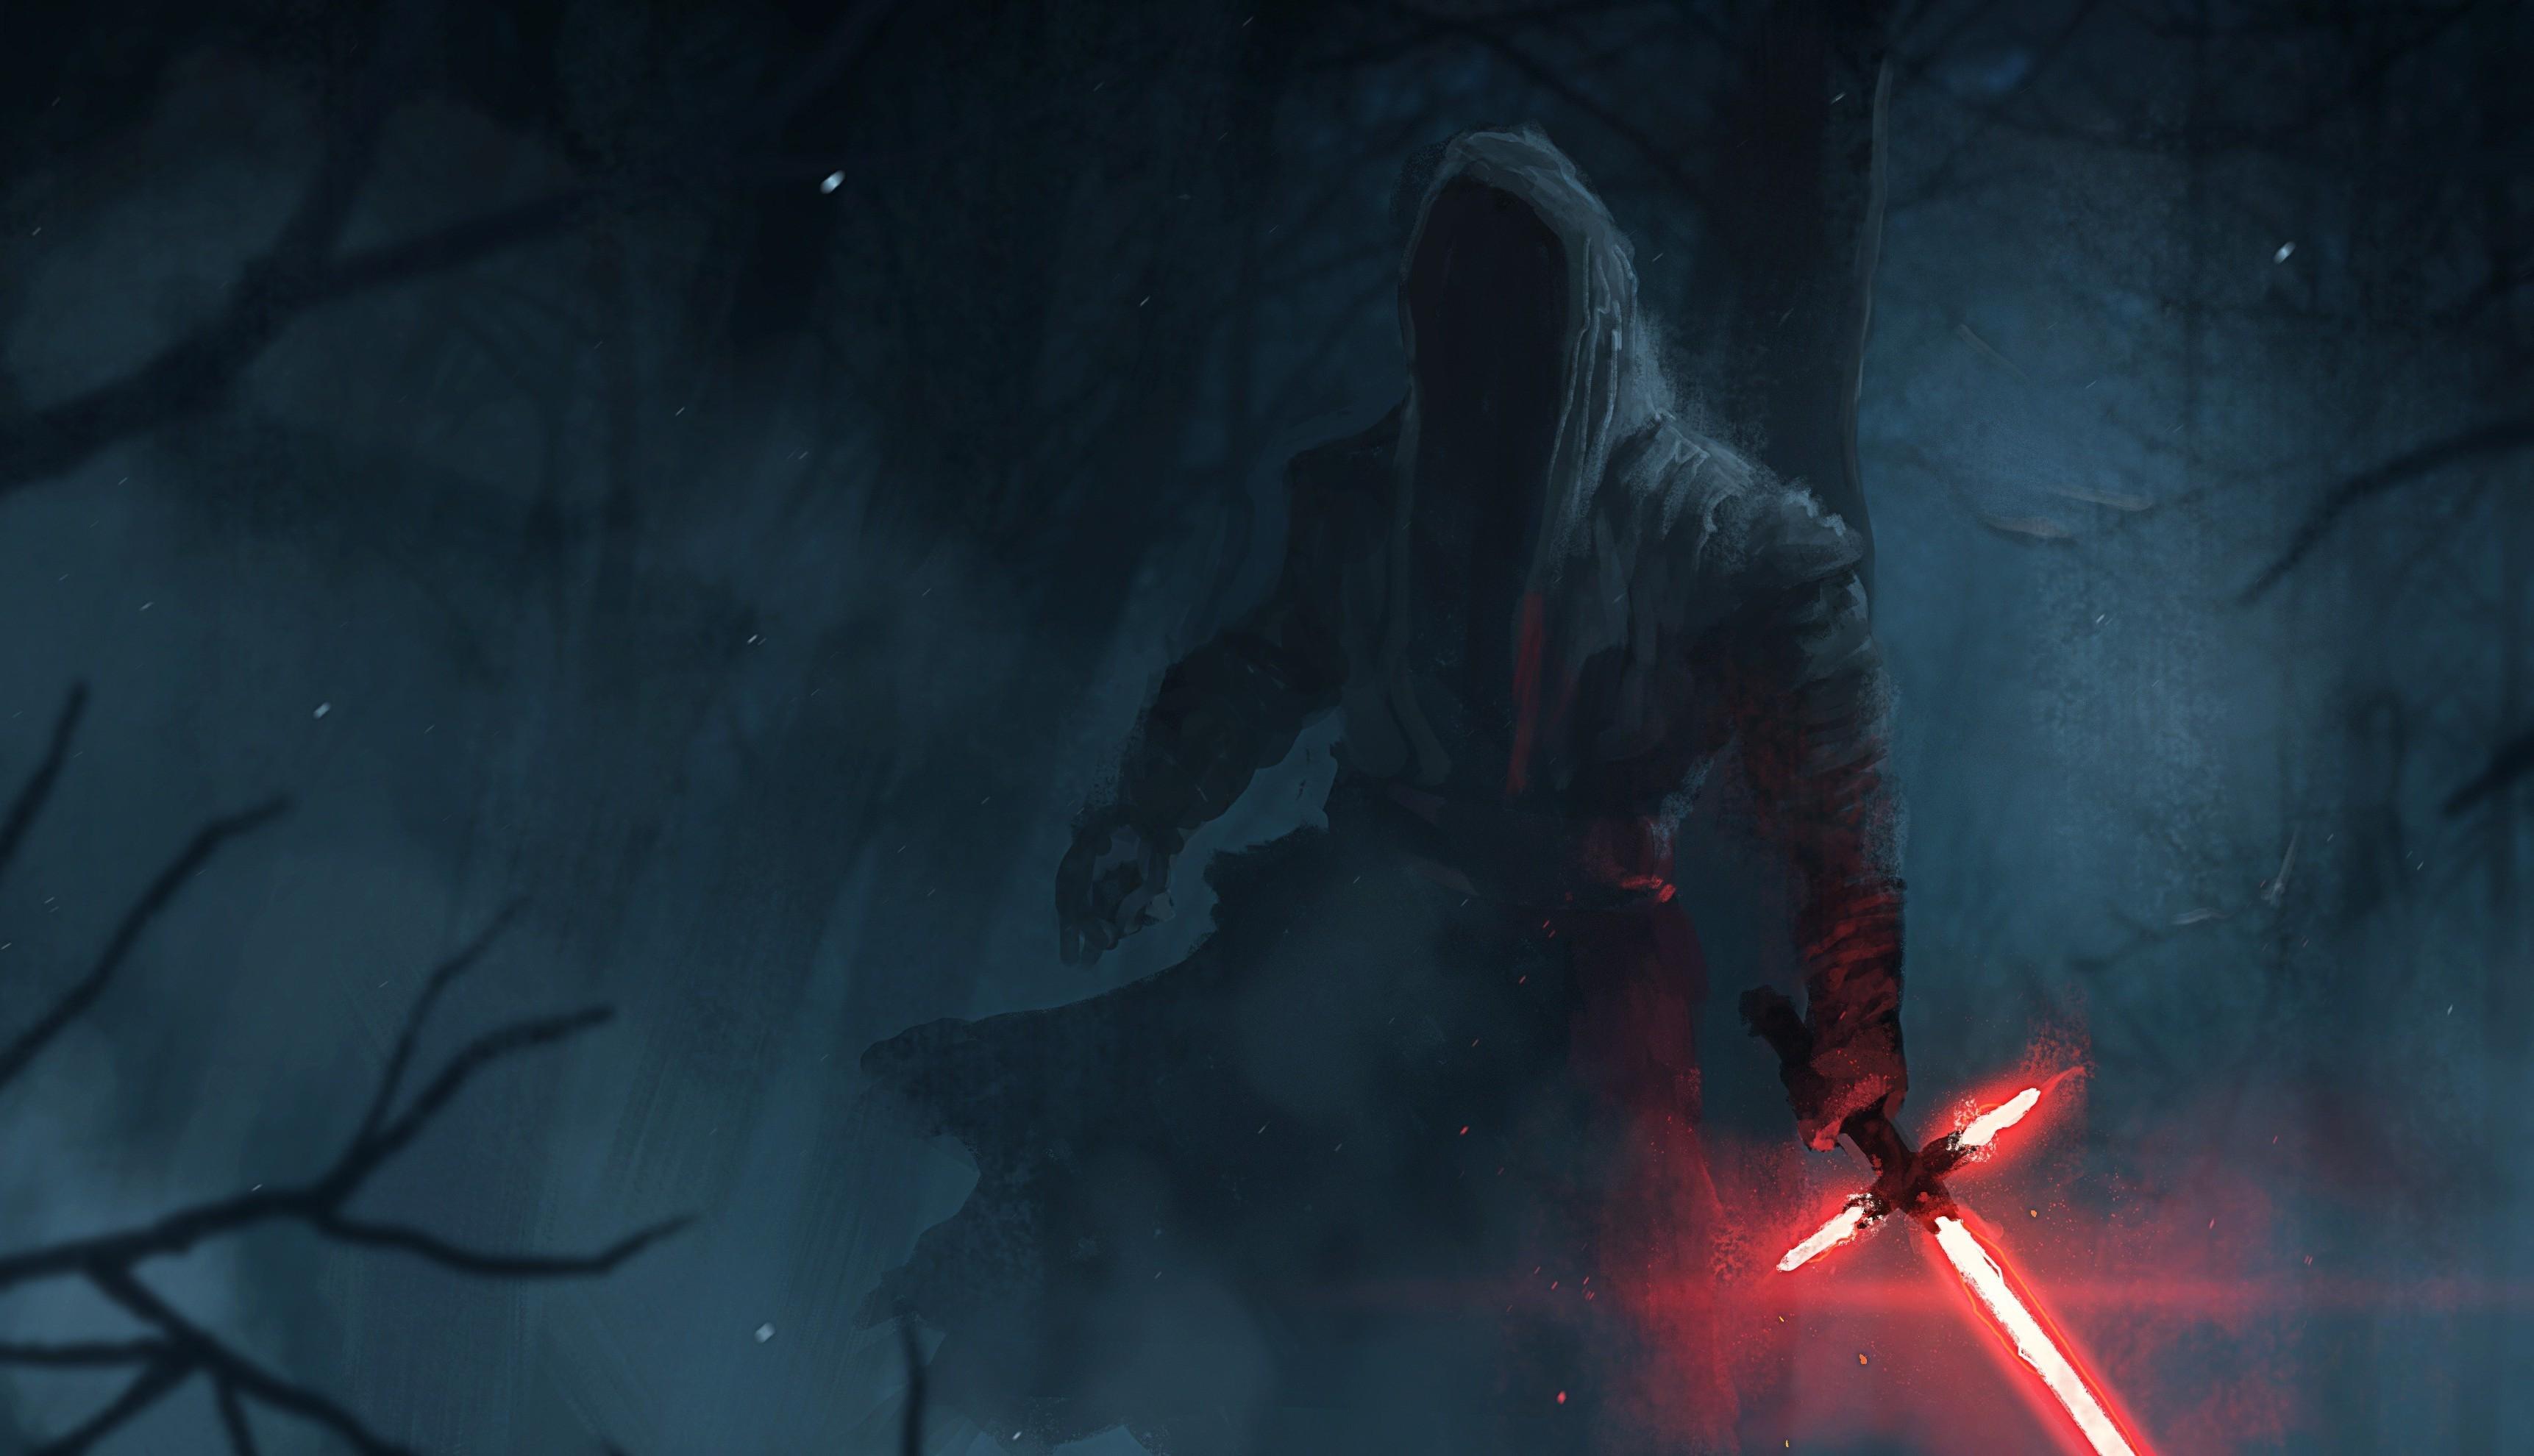 Kylo Ren, Star Wars, Star Wars: The Force Awakens, Lightsaber Wallpapers HD  / Desktop and Mobile Backgrounds